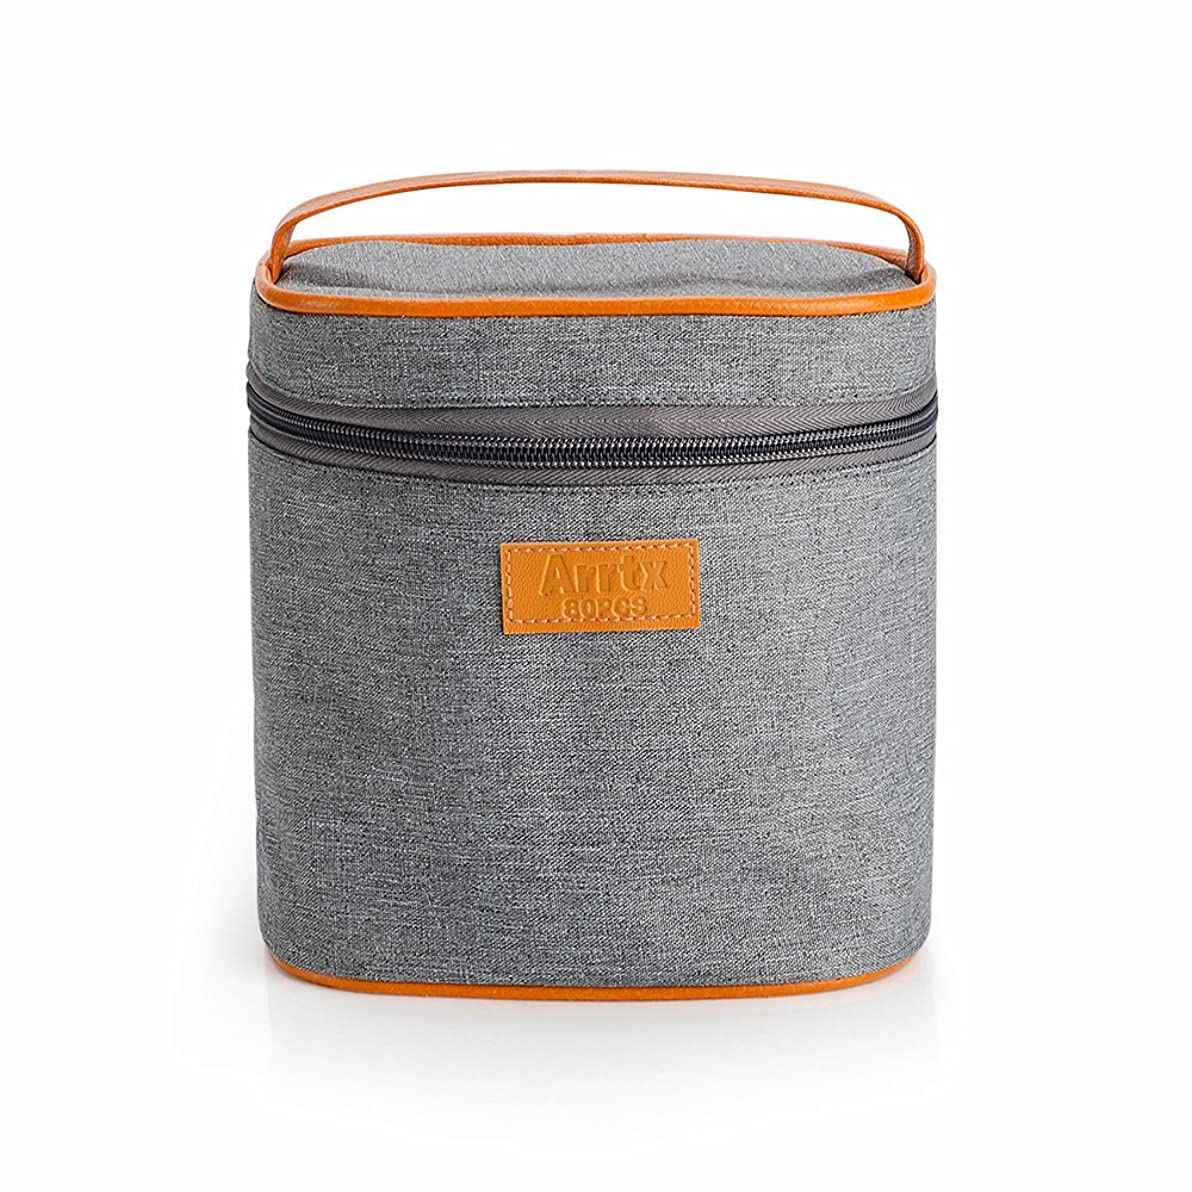 Arrtx Grey Canvas Zipper Marker Pen Handbag Bags Large Capacity Stationery Case Pen Box School Supplies